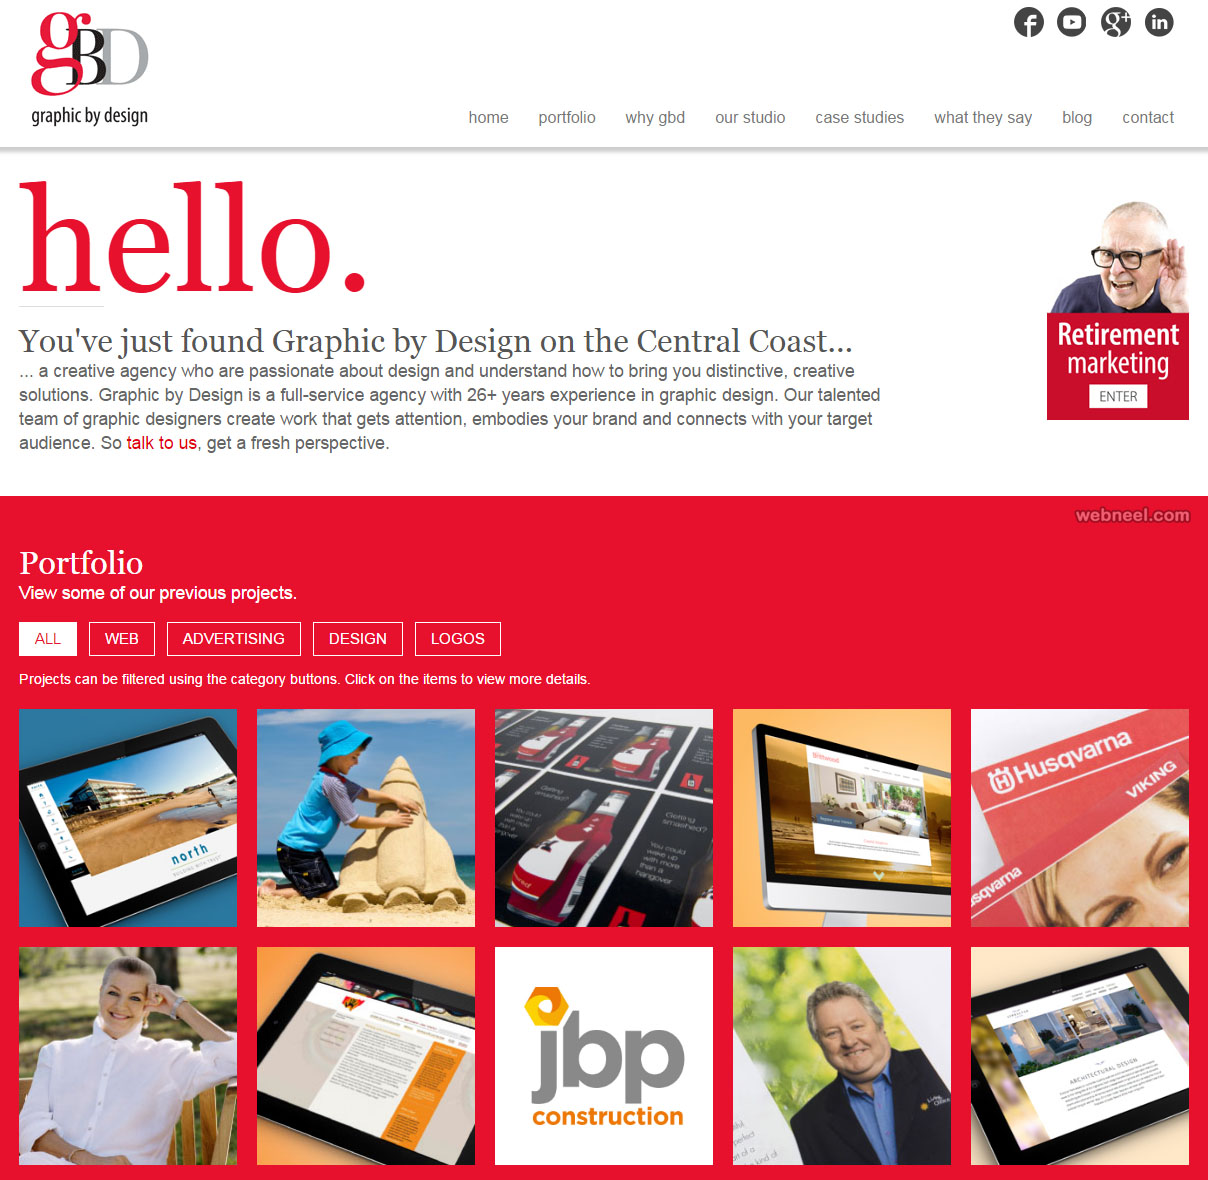 gbd graphic design website